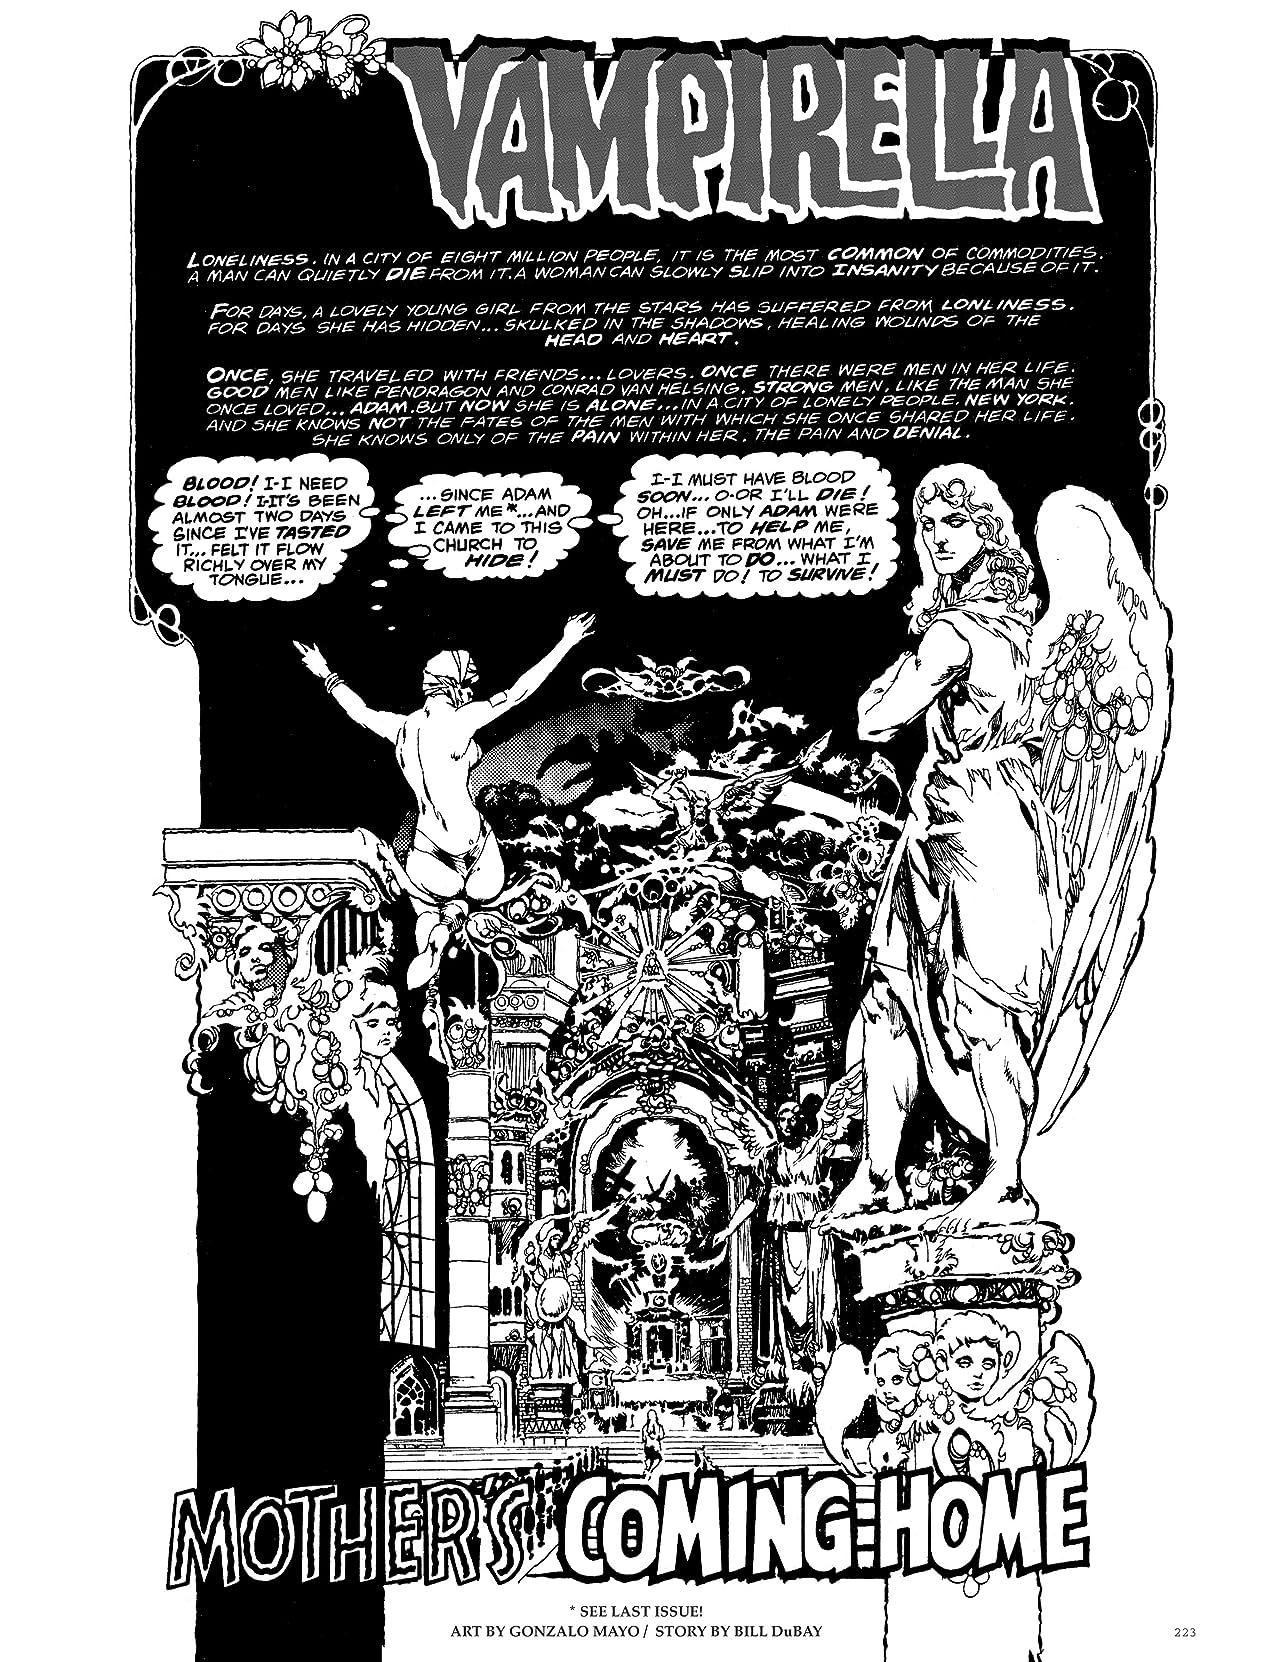 Vampirella (Magazine 1969-1983) #47